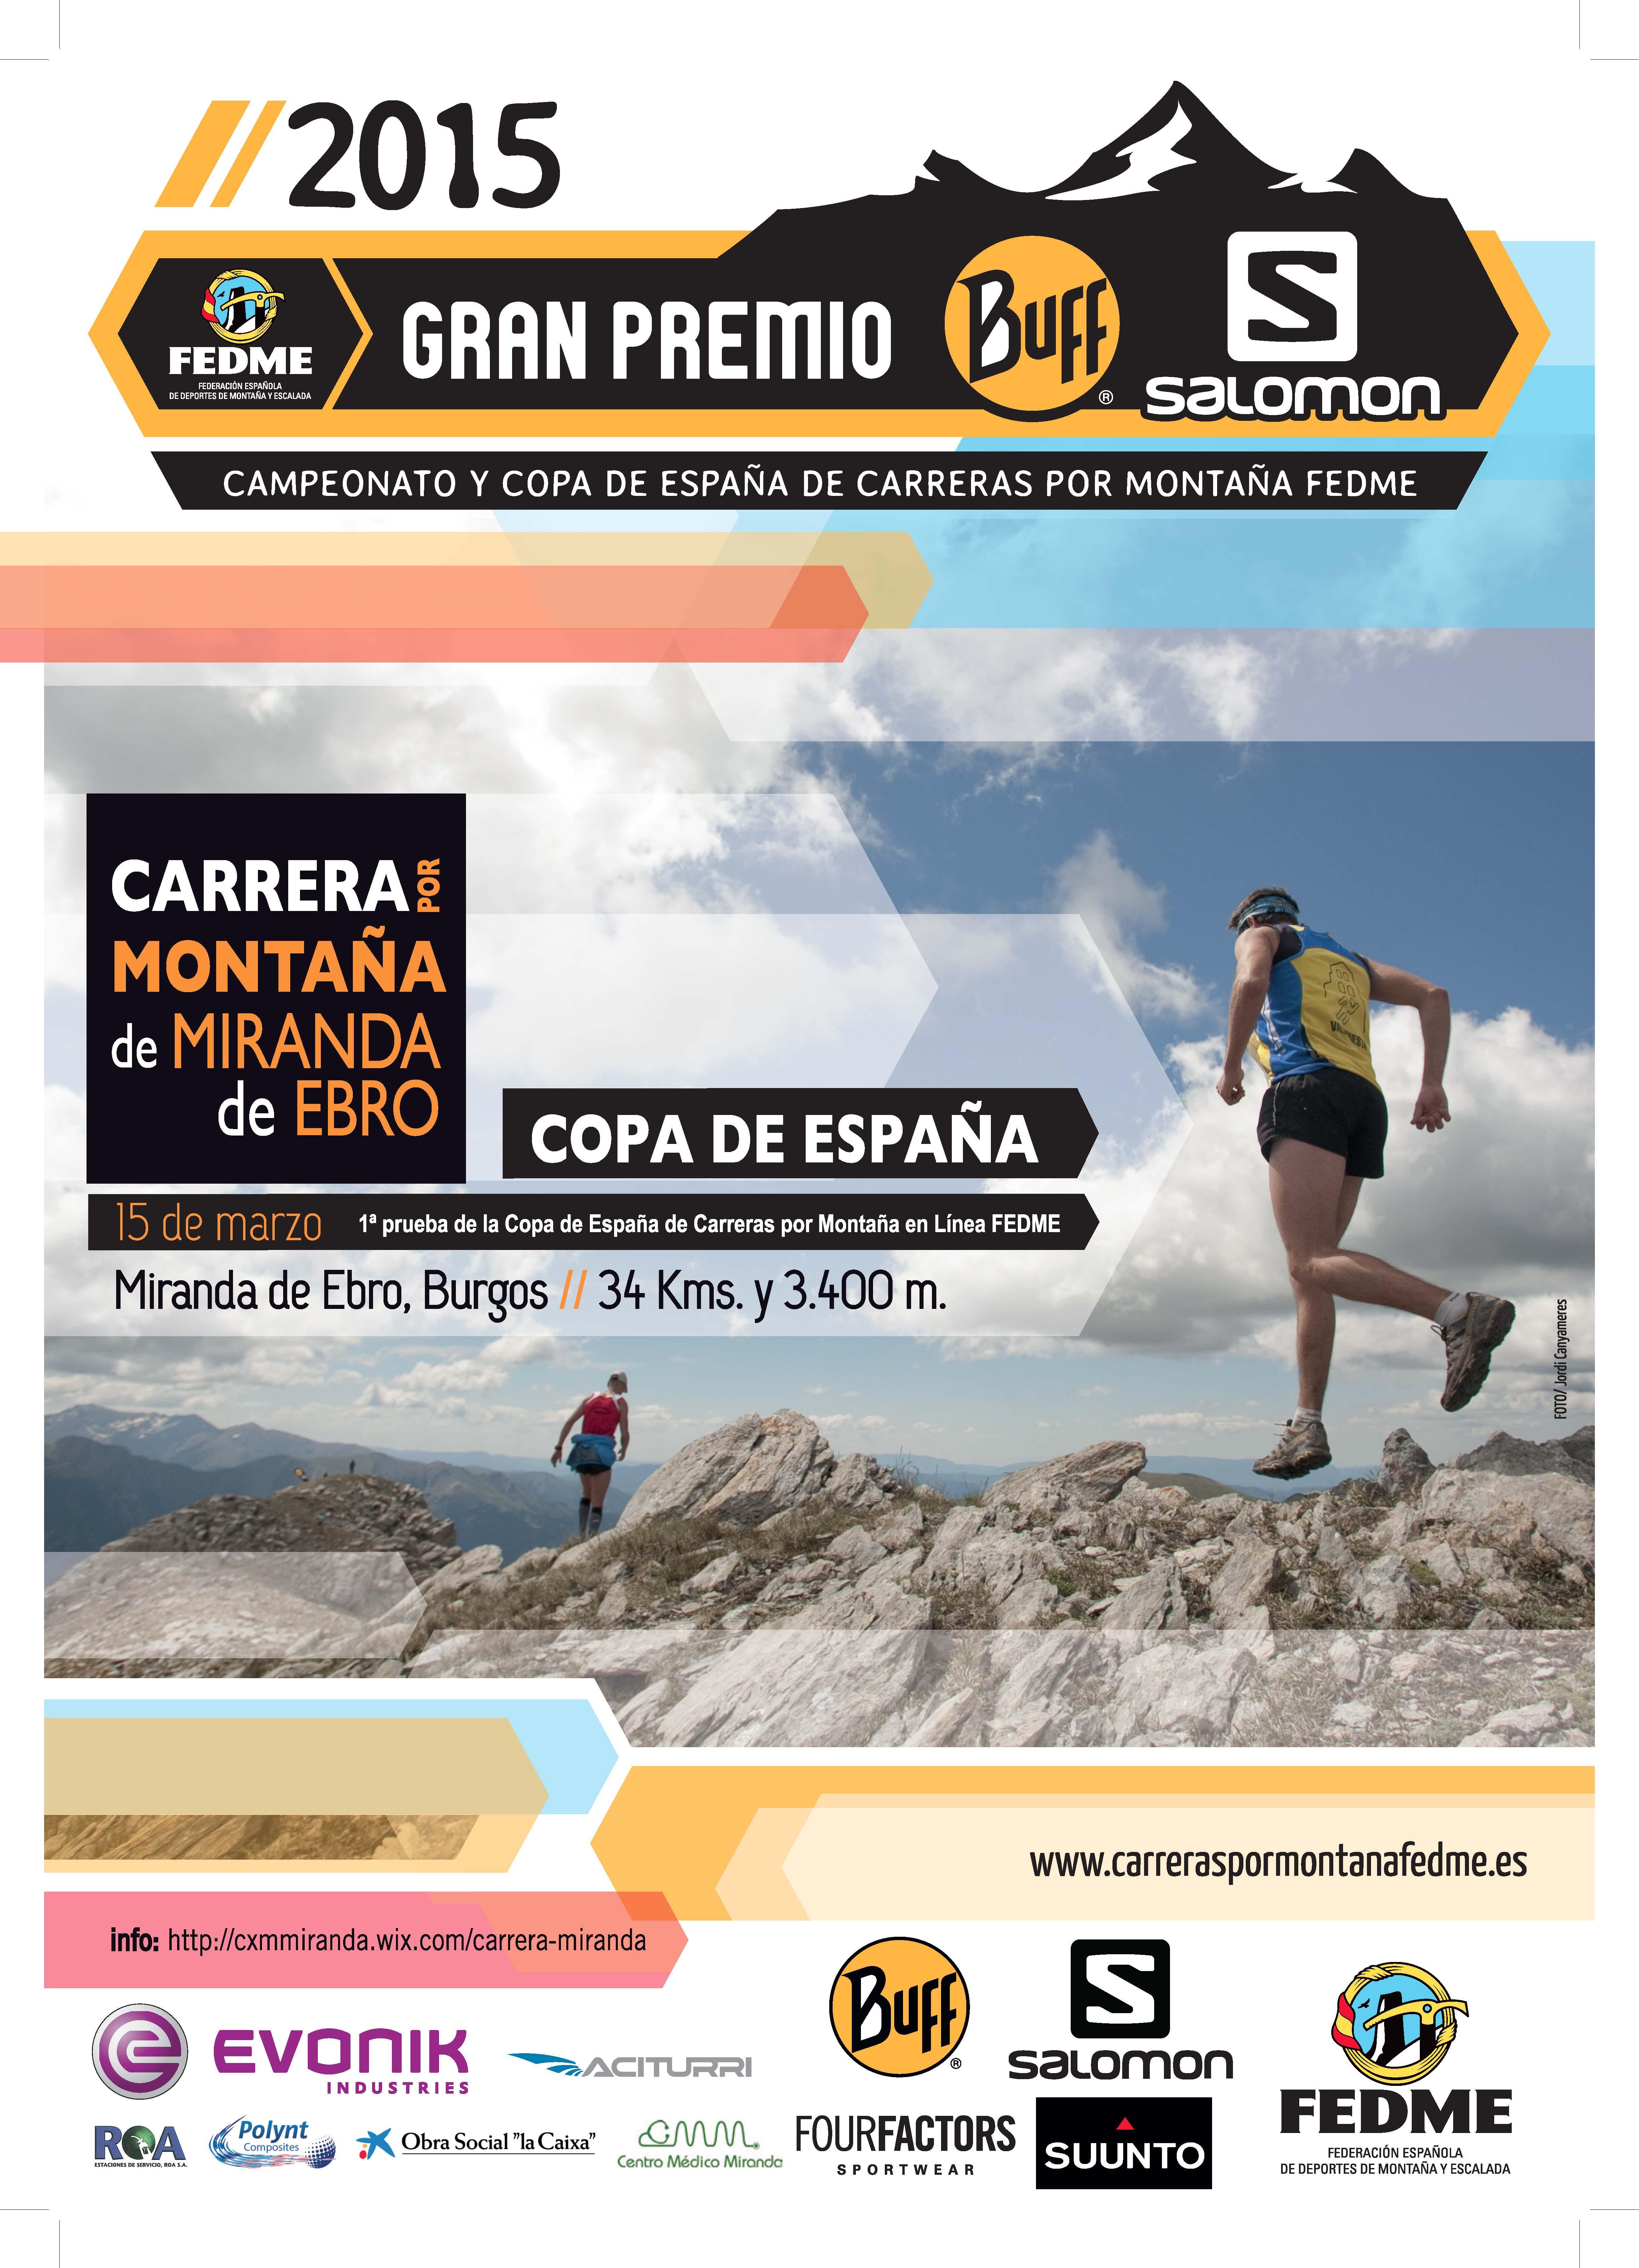 Arranca la Copa de España FEDME - Gran Premio Buff® Salomon 2015 en la Carrera por Montaña de Miranda de Ebro